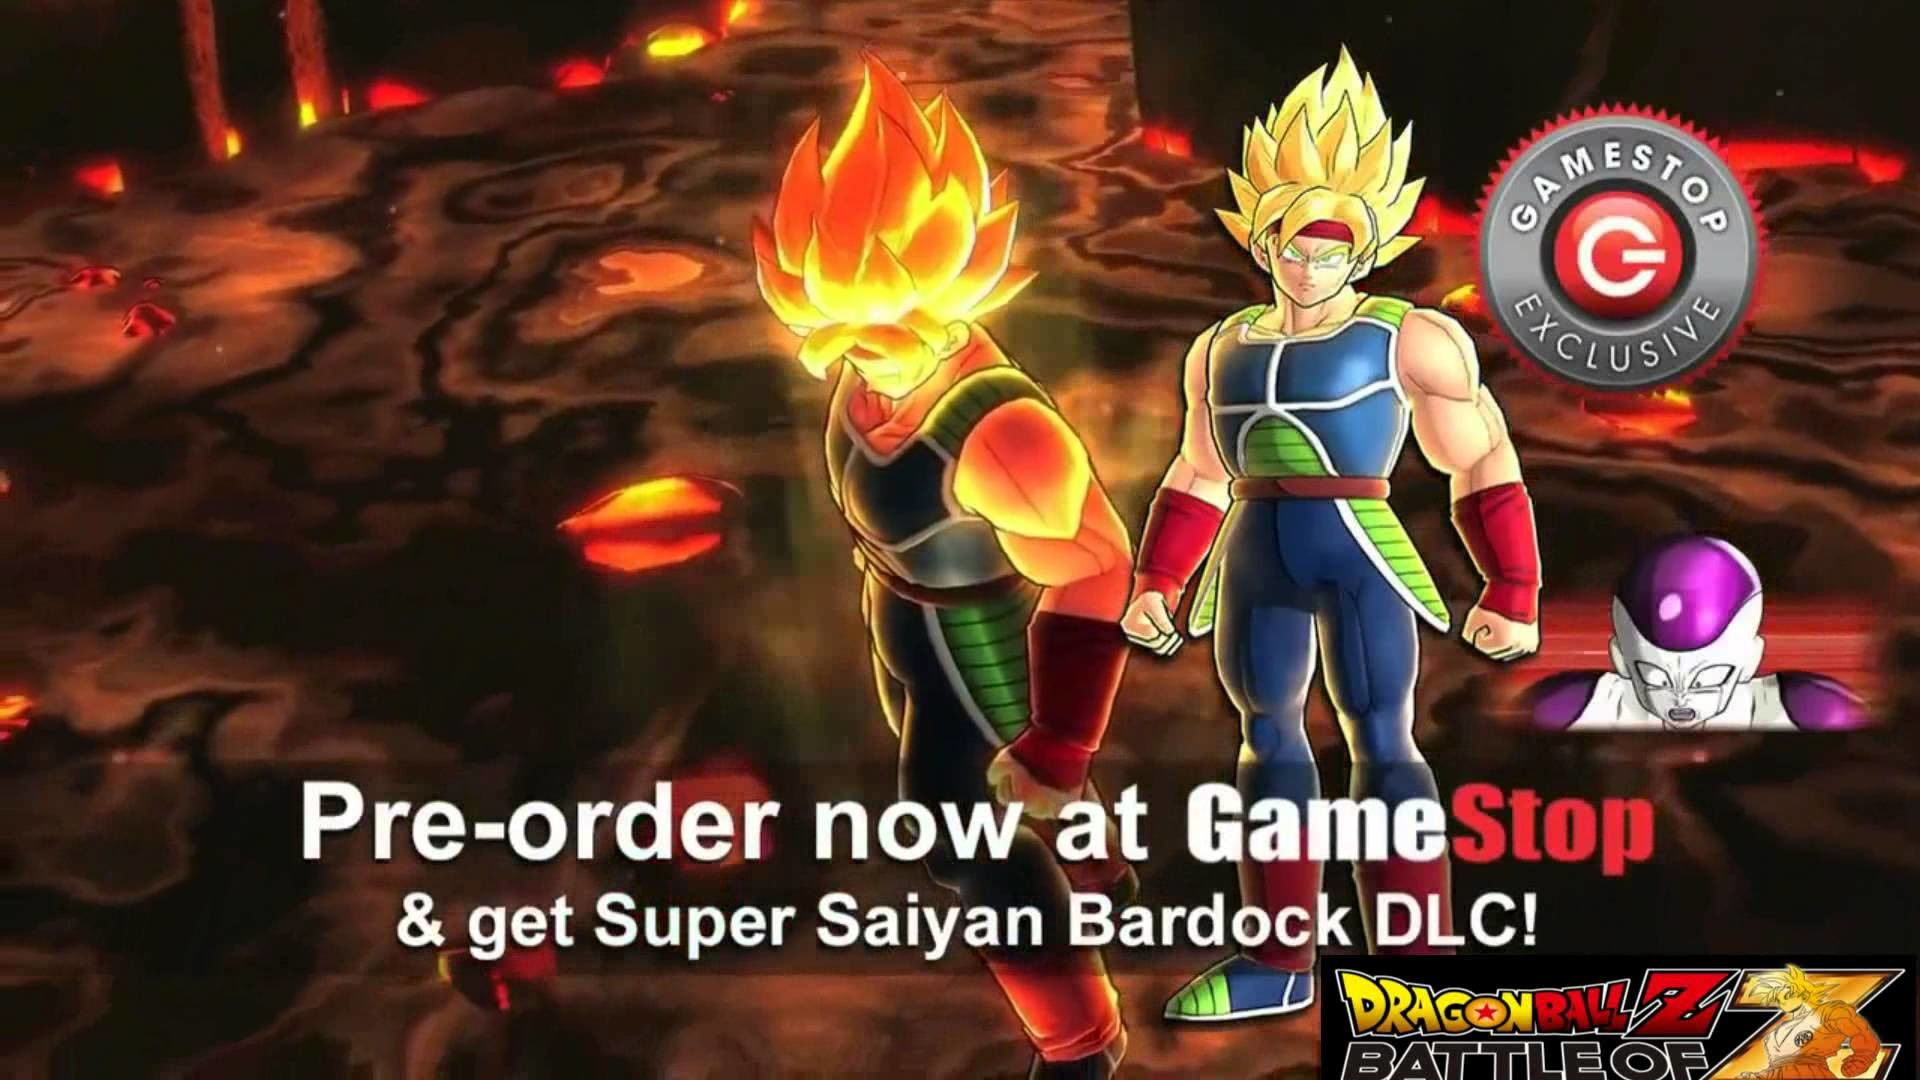 【Dragon Ball Z: Battle of Z】 SSJ Bardock DLC PS3 / X360 / PSVITA – YouTube